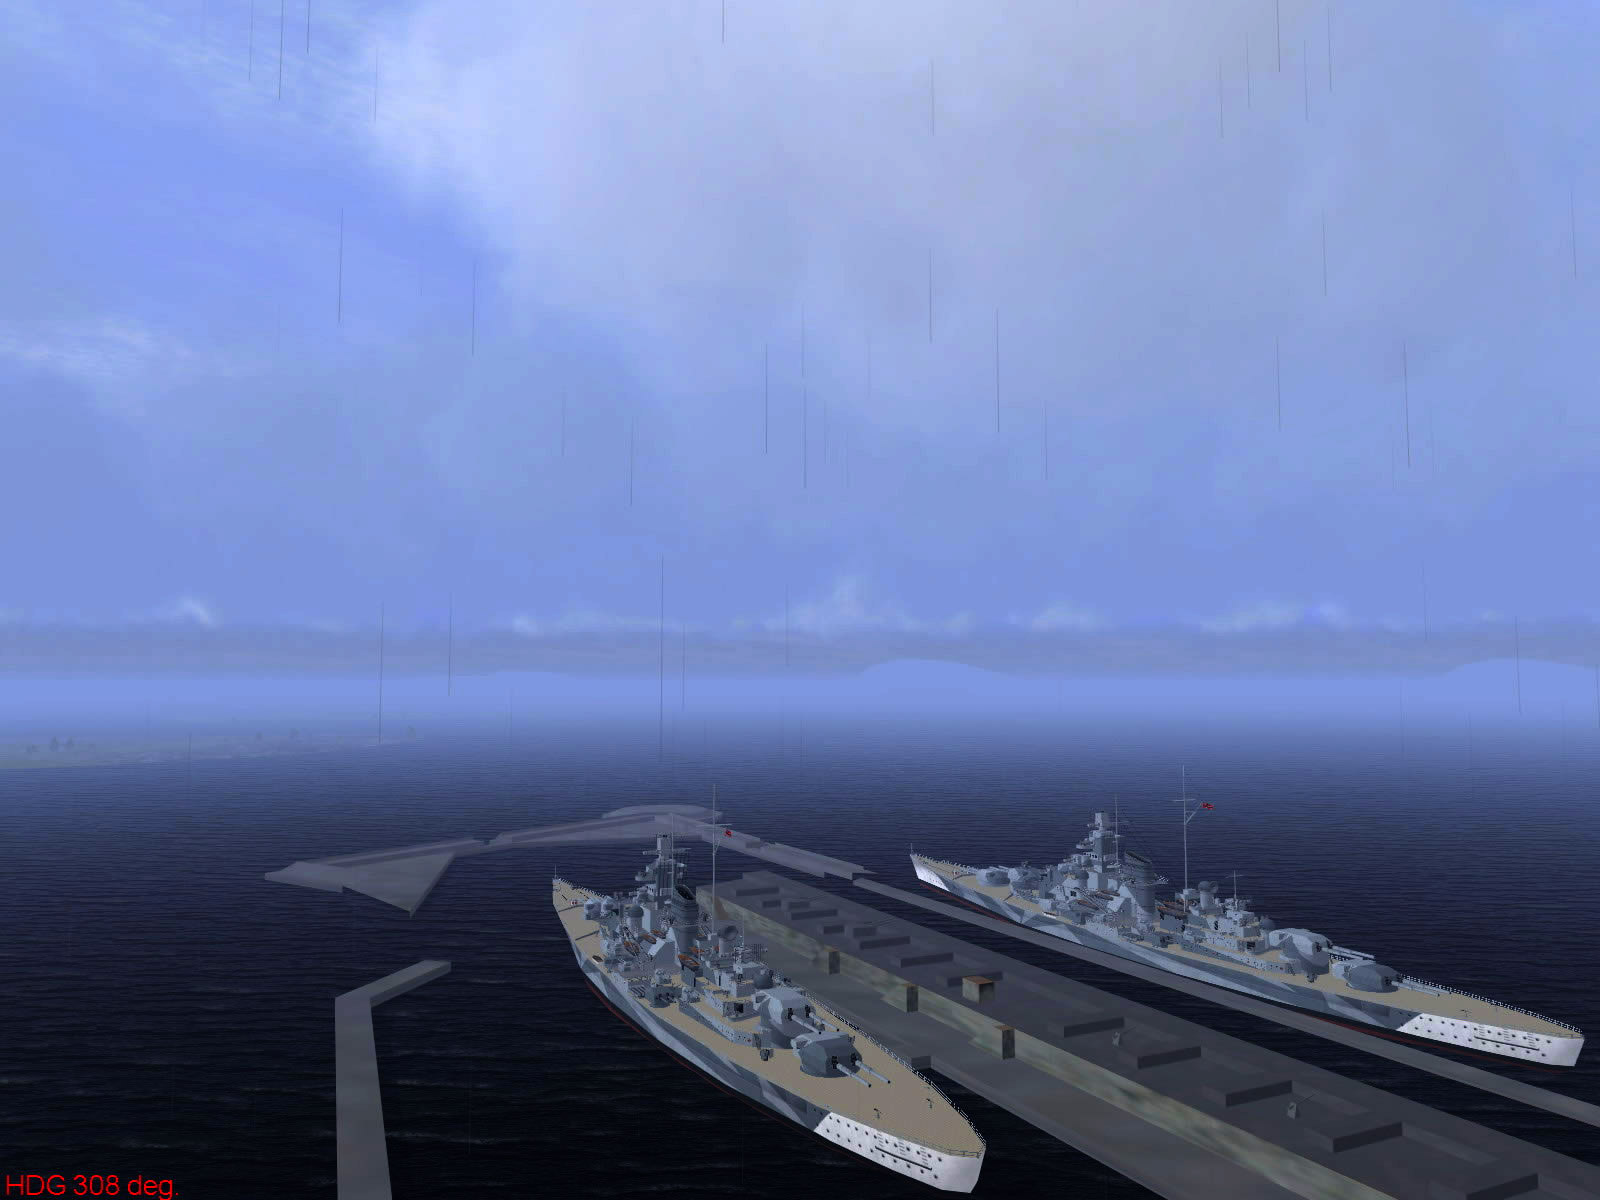 Ubisoft IL2 Sturmovik game version of harbor objets 03